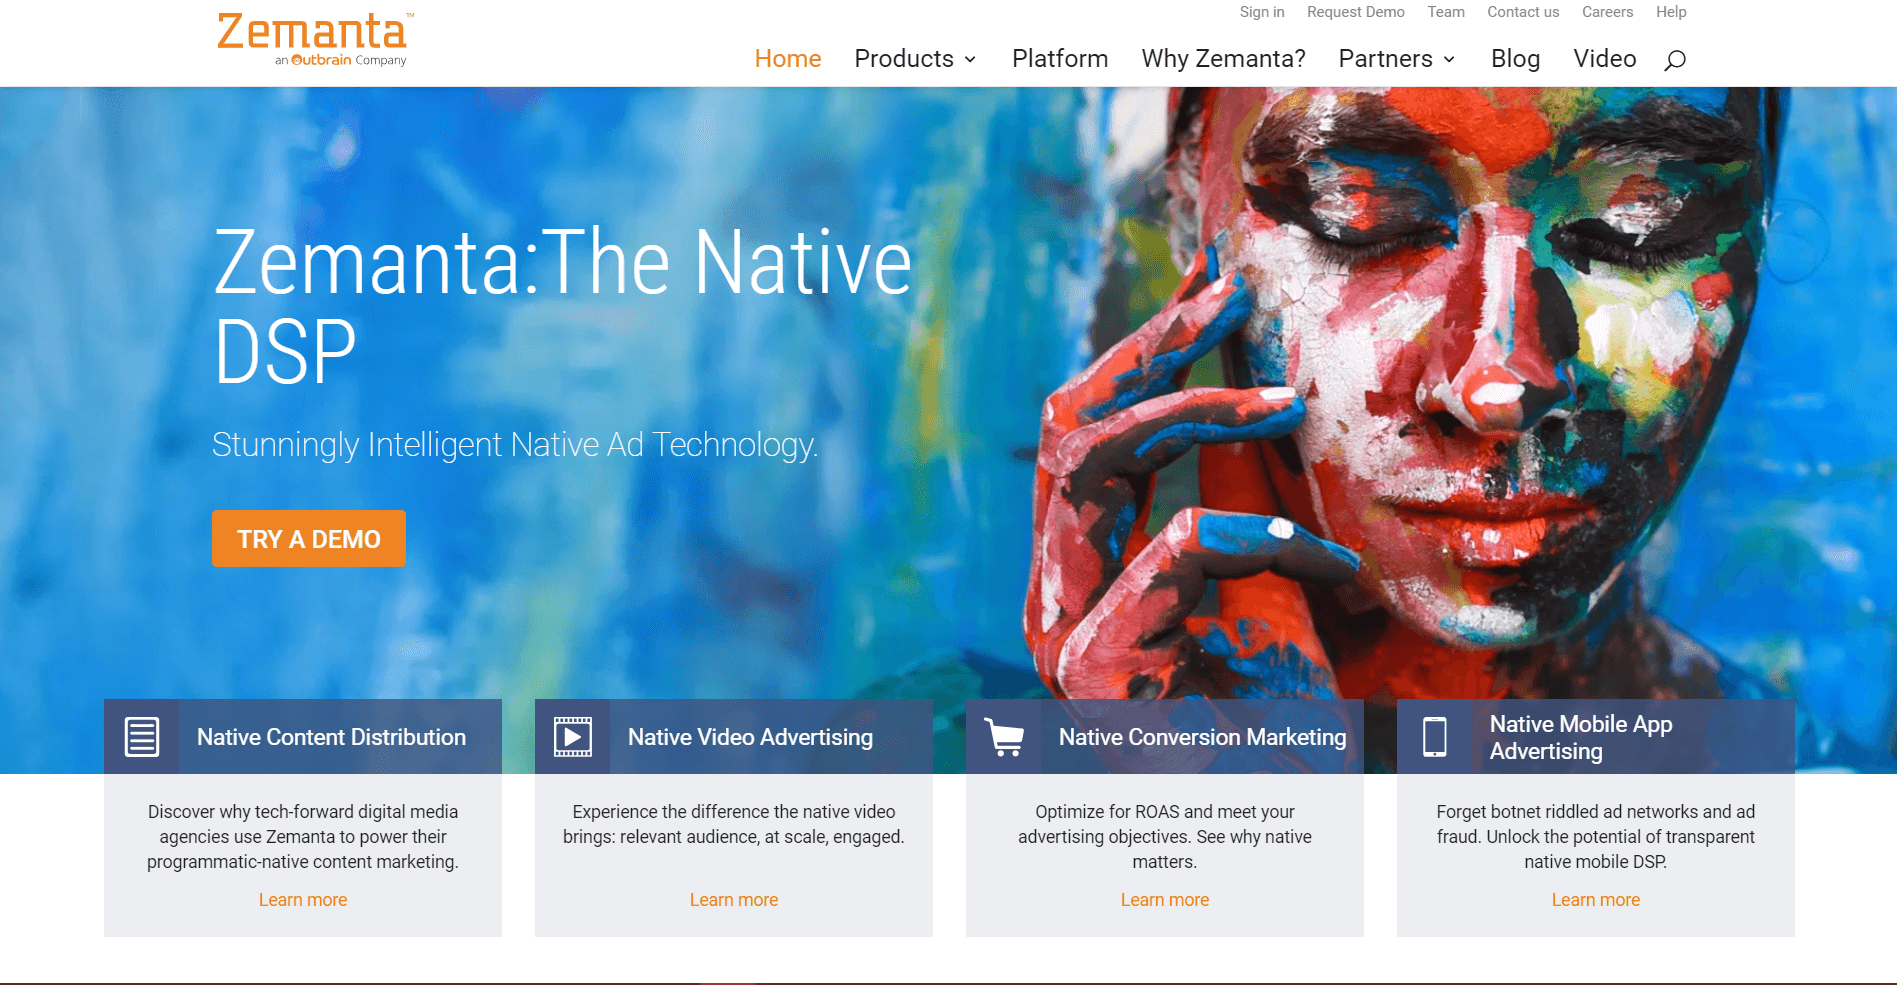 zemanta Content Promotion Platforms and Tools